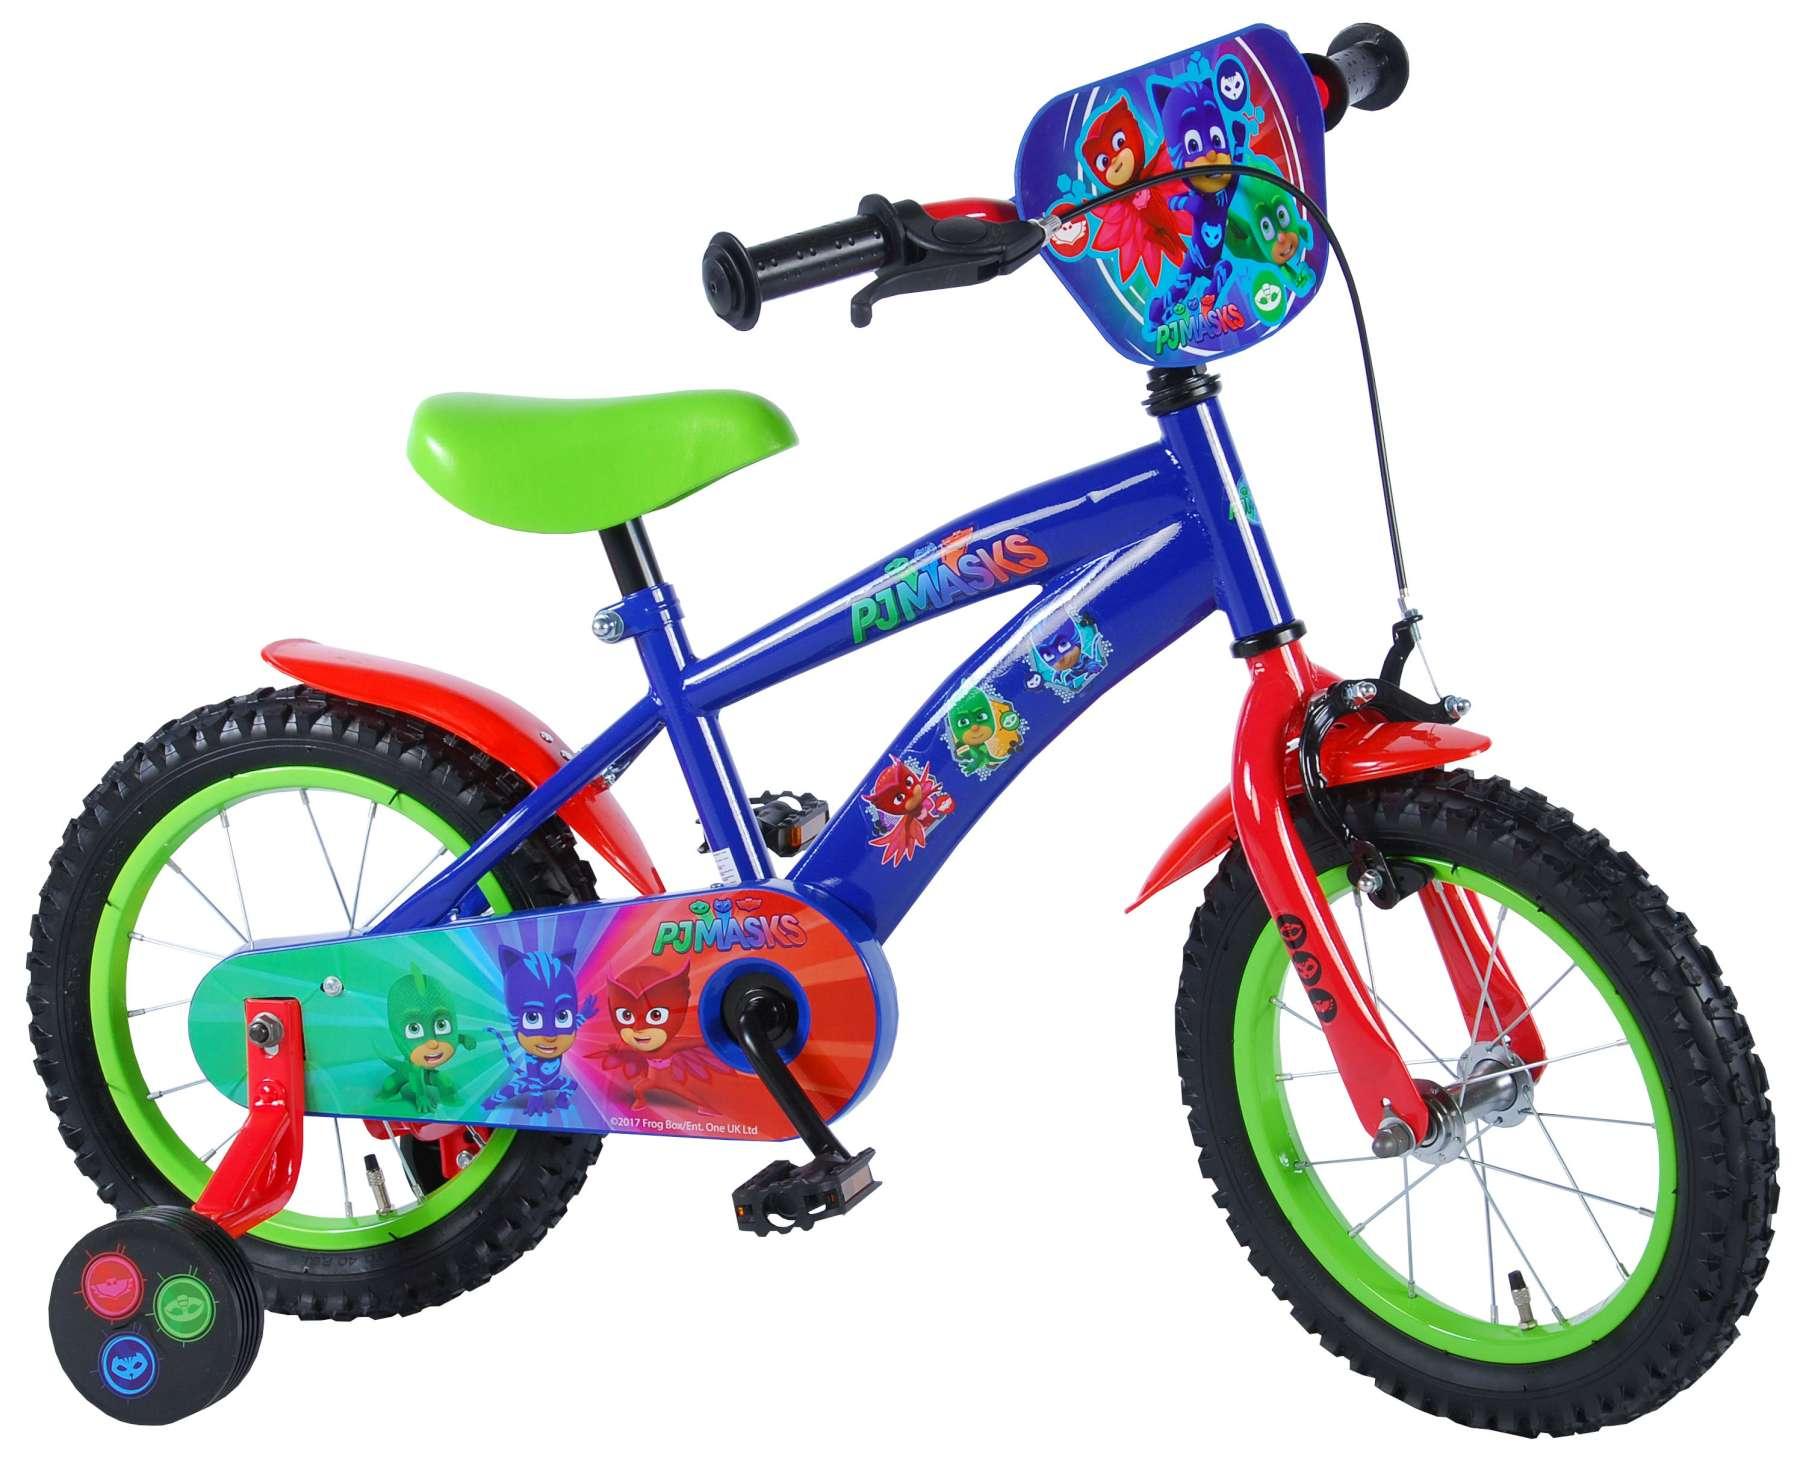 Volare Børnecykel 14 PJ Masks | City